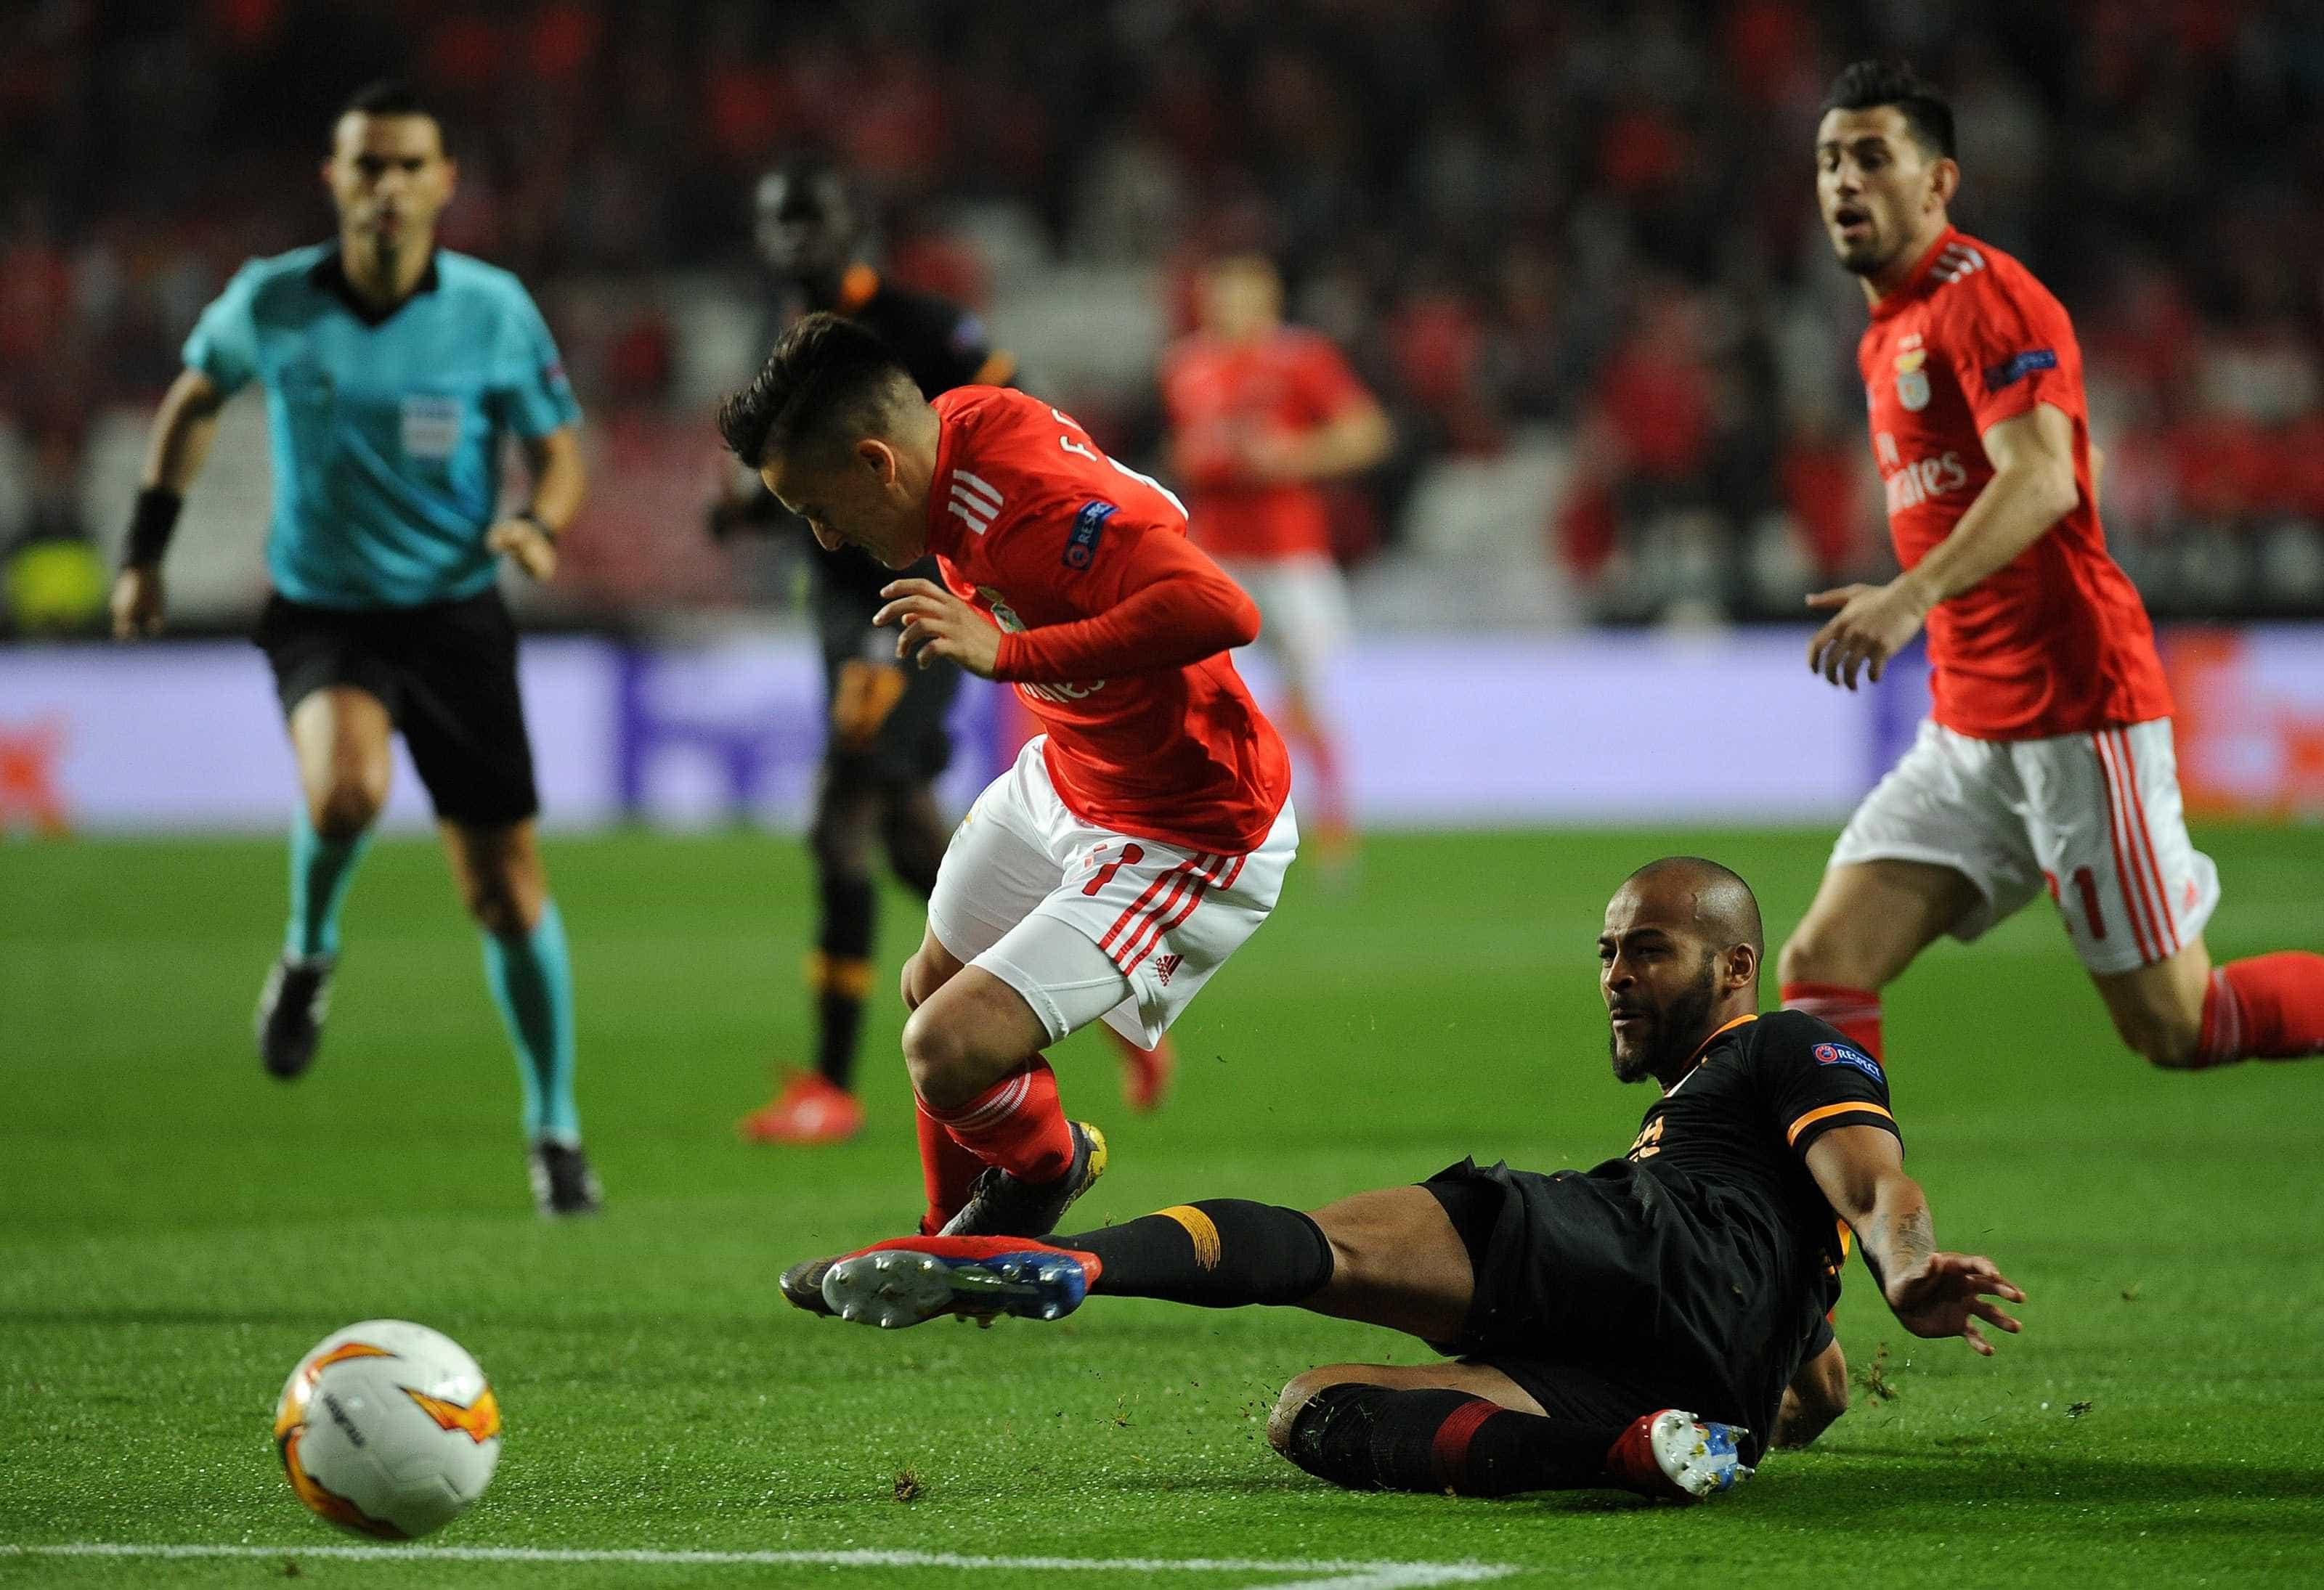 Benfica nos 'oitavos' da Liga Europa sem passar da estaca zero